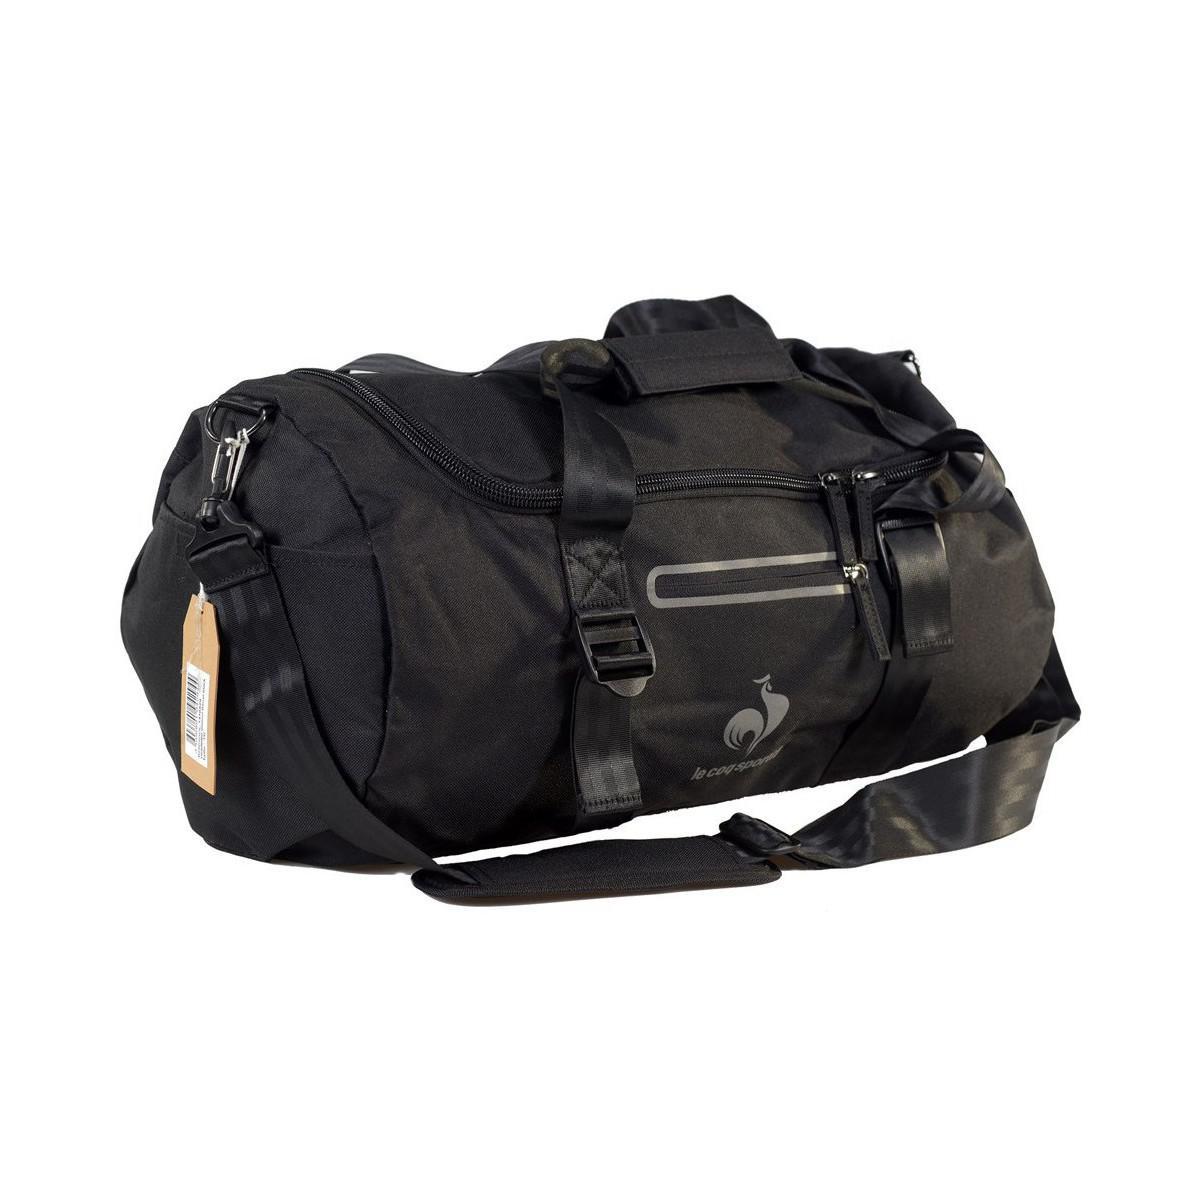 c443427ee6e Le Coq Sportif Training Glaieul Barrel Black Women's Sports Bag In ...